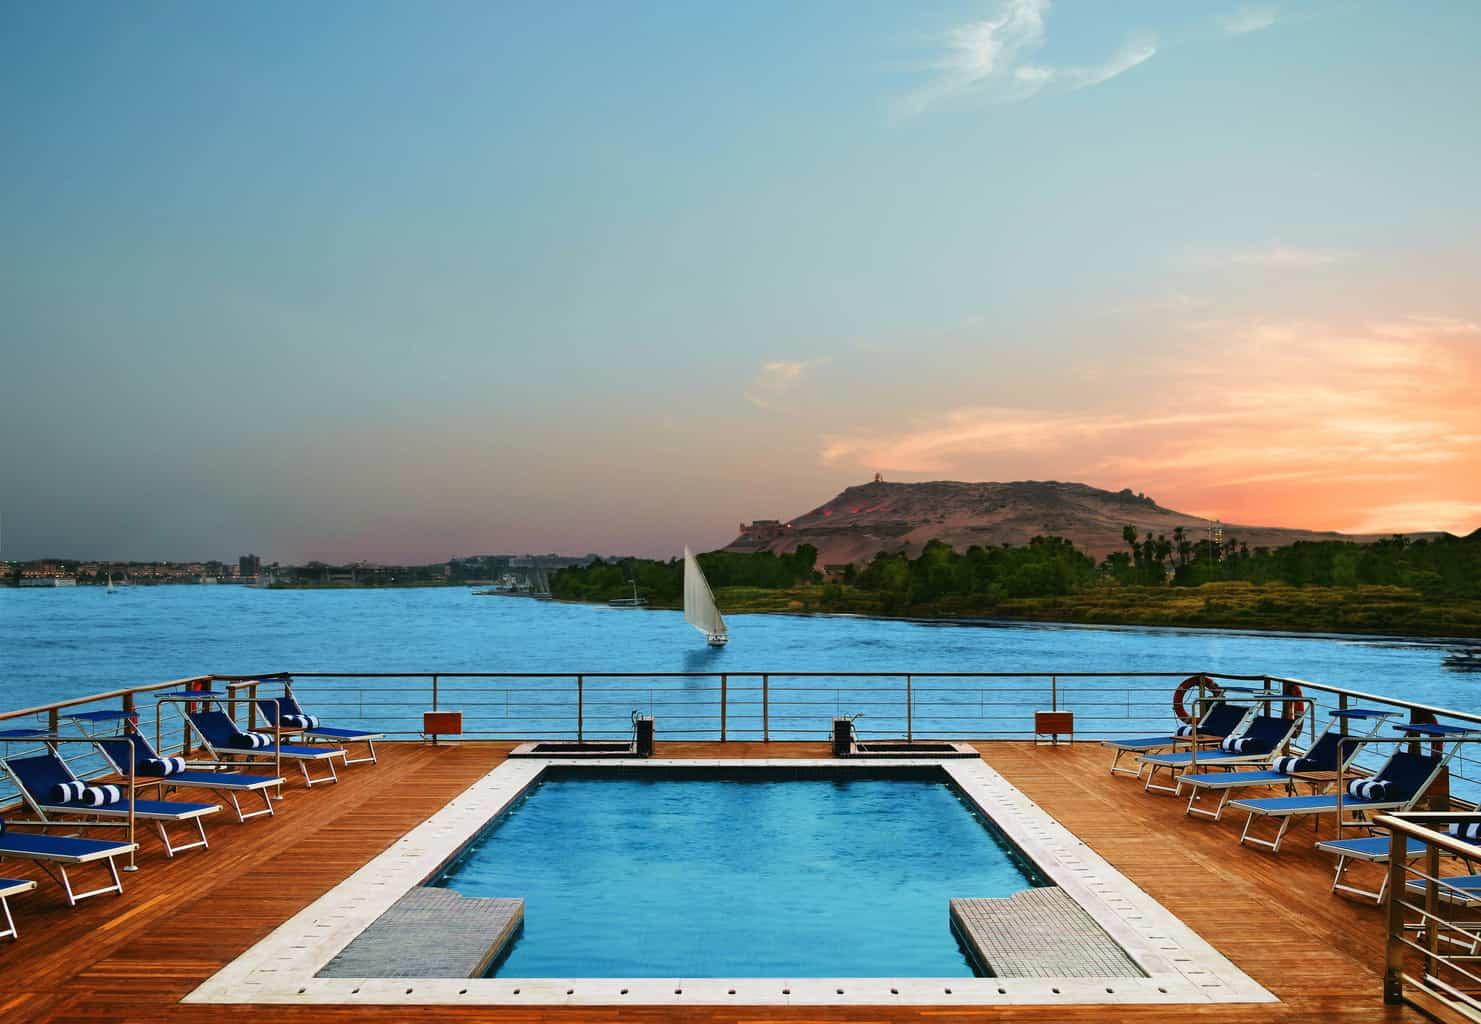 A-piscina-no-deck-do-Oberoi-Zahra-é-perfeita-para-momentos-de-relaxamento-a-dois-diante-de-paisagens-deslumbrantes-do-Nilo.